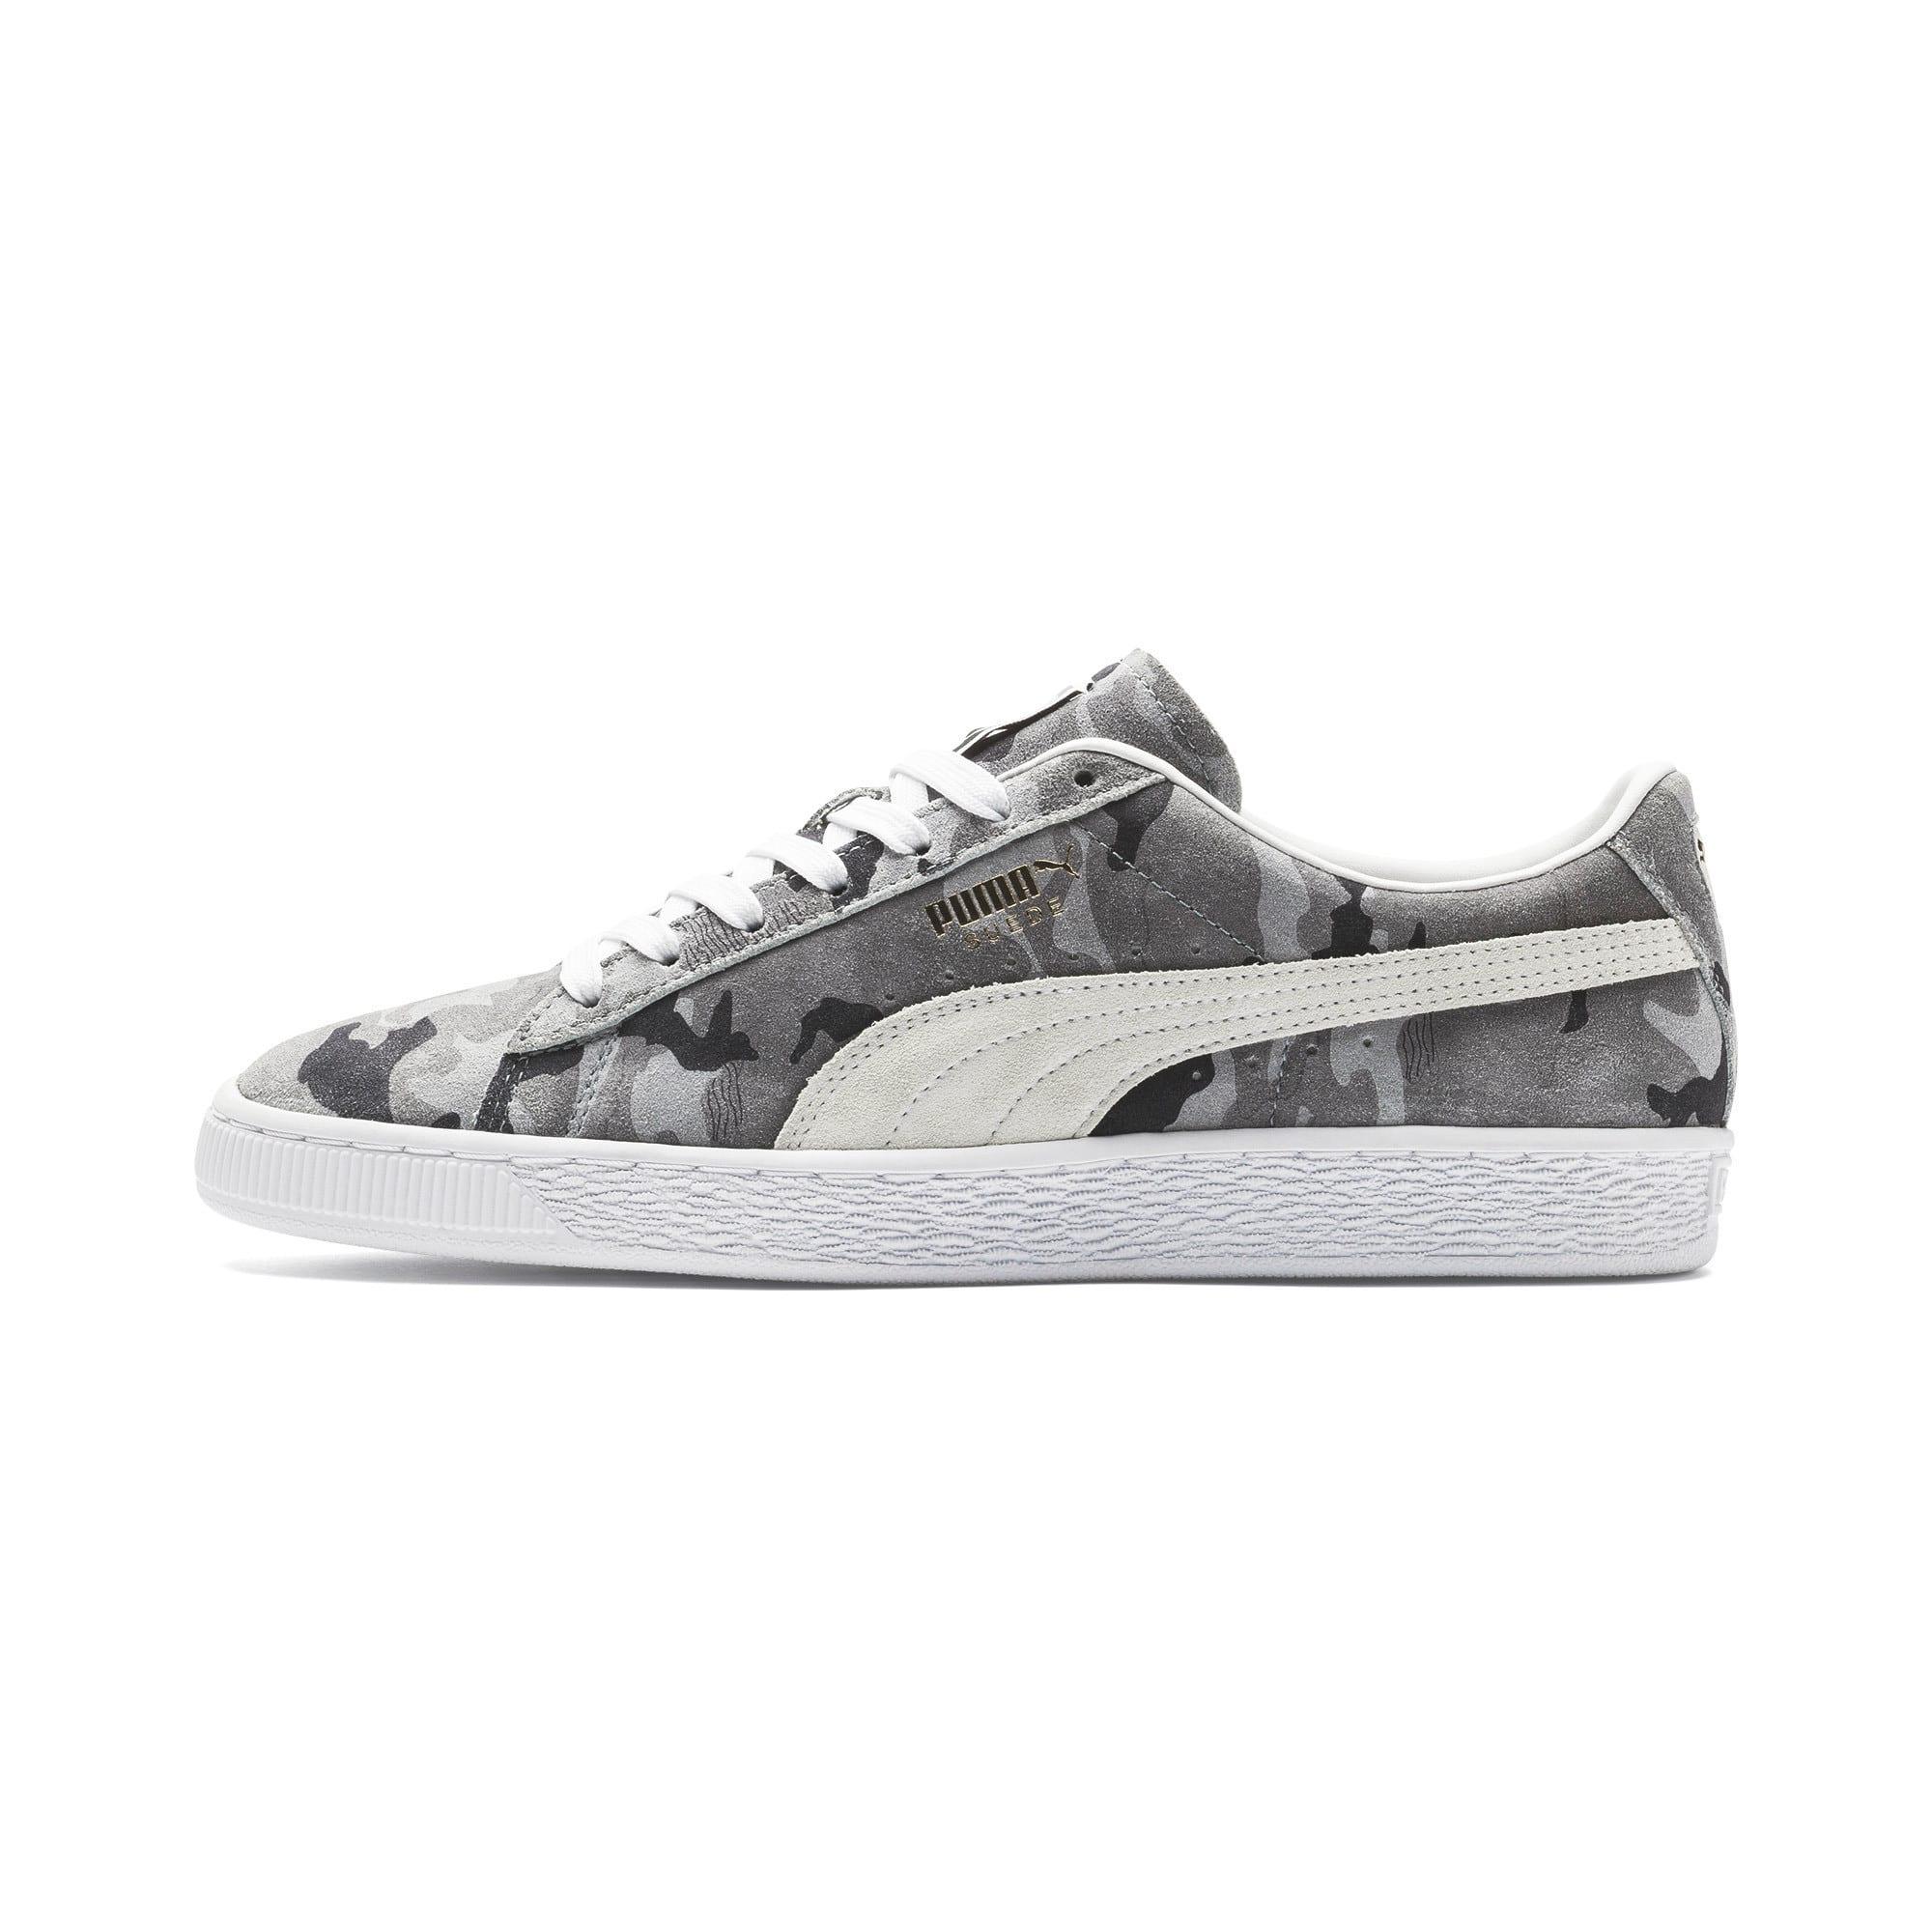 Thumbnail 1 of Suede Classic Ambush Sneakers, Puma Black-CASTLEROCK-White, medium